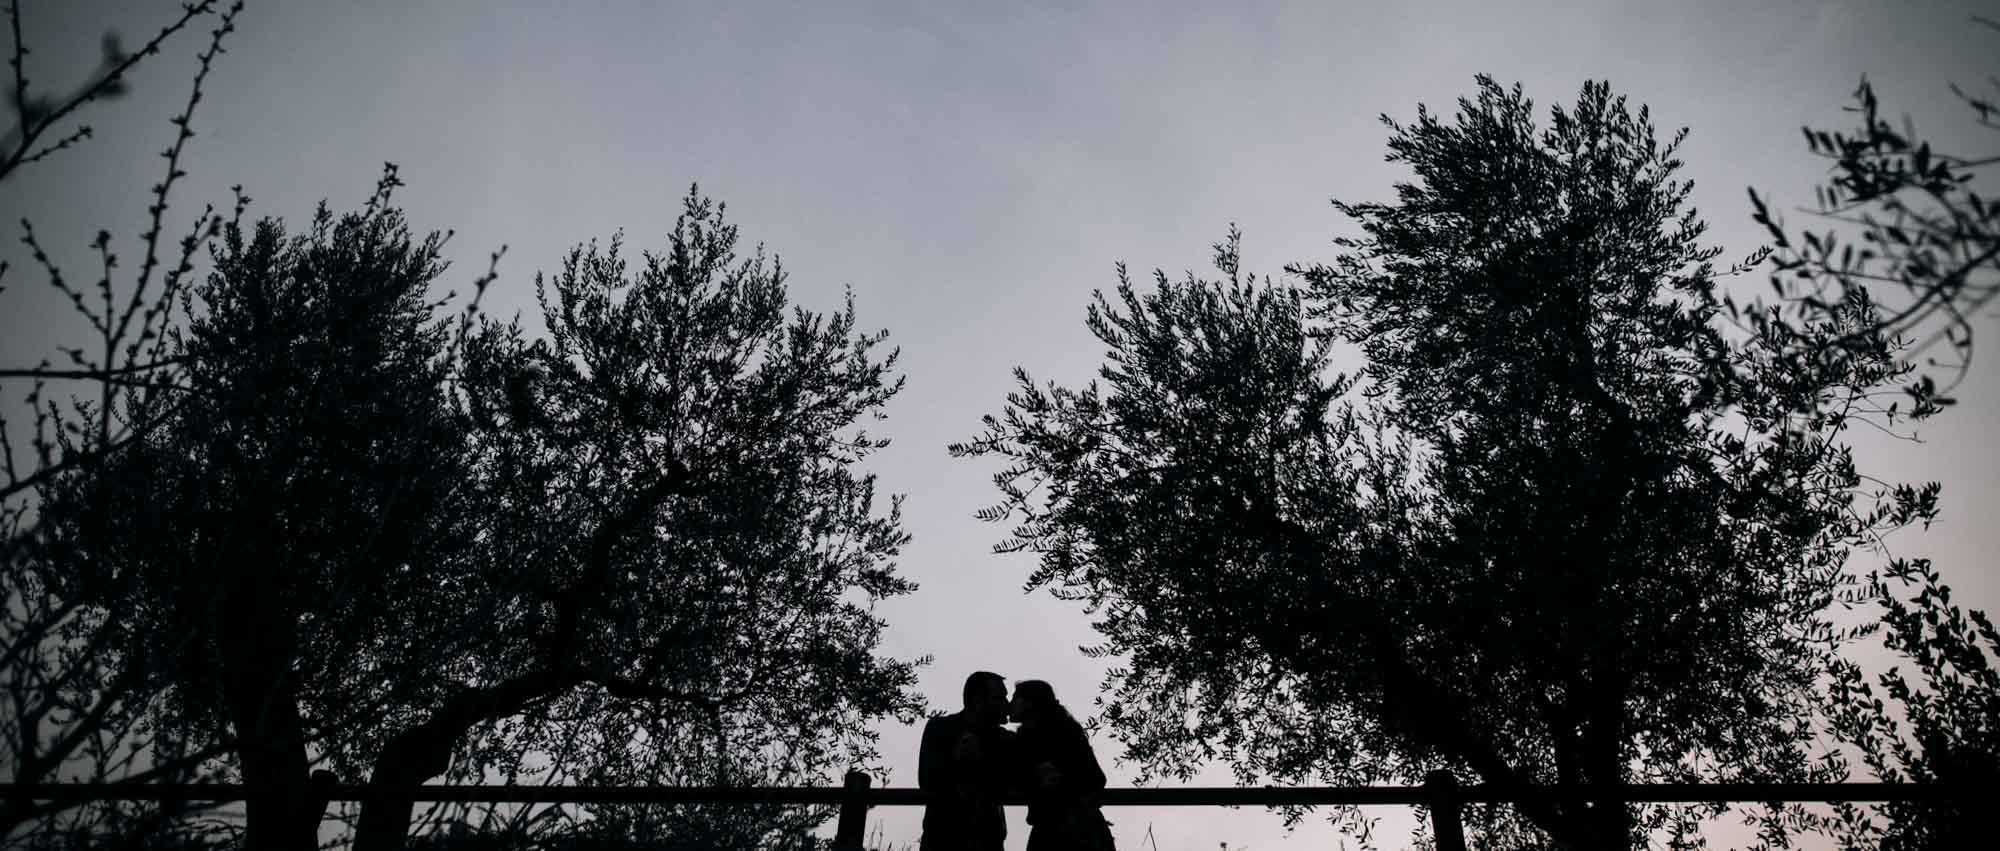 couple photos lake garda 001 - Couple Photos Lake Garda - Marta & Mauro